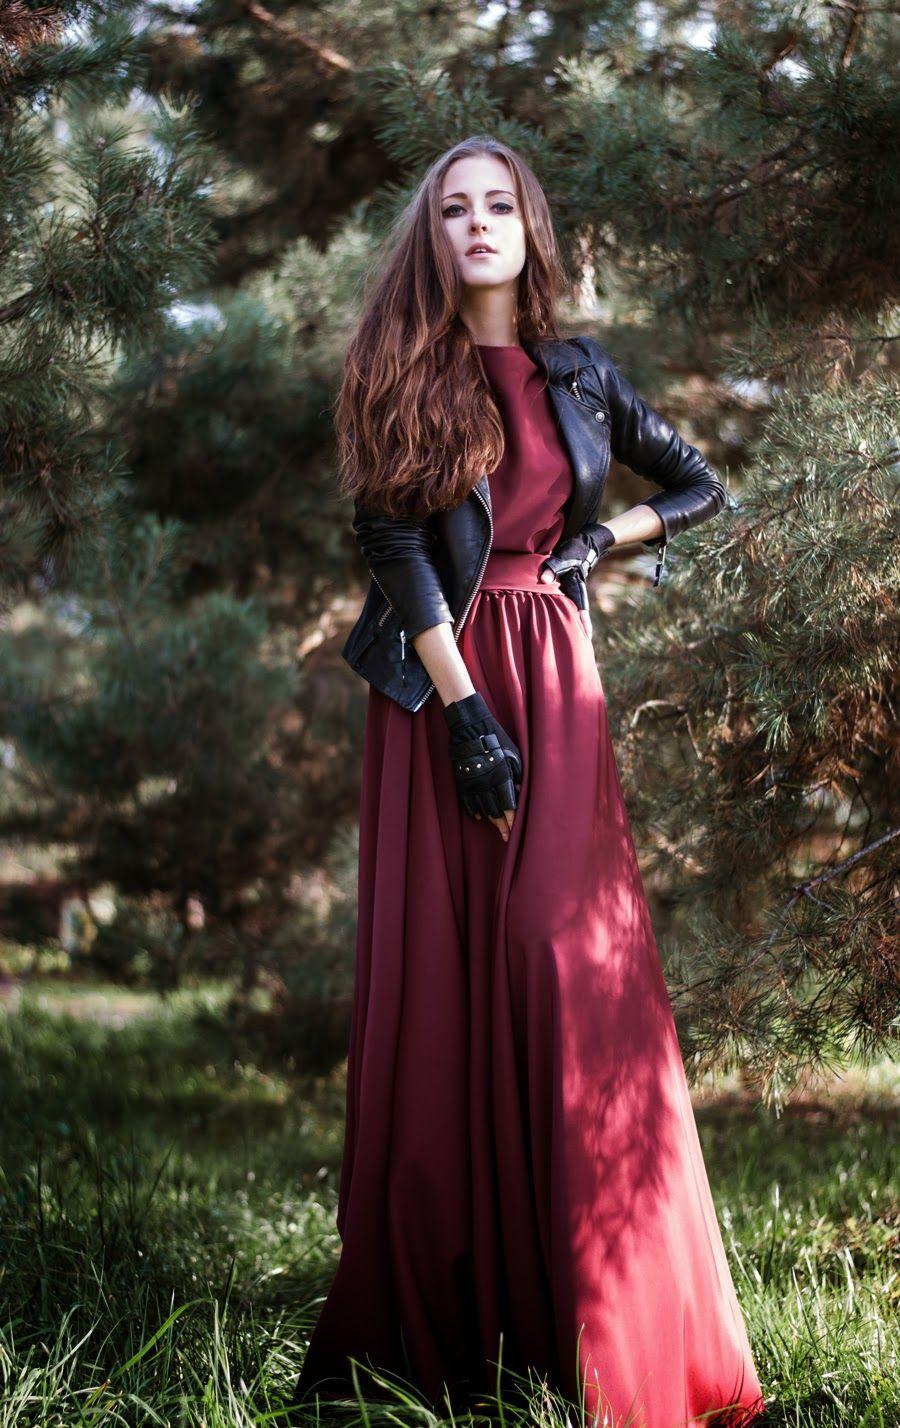 Black gloves for gown - Gloves Good Girl Gone Bad Burgundy Gown Black Moto Leather